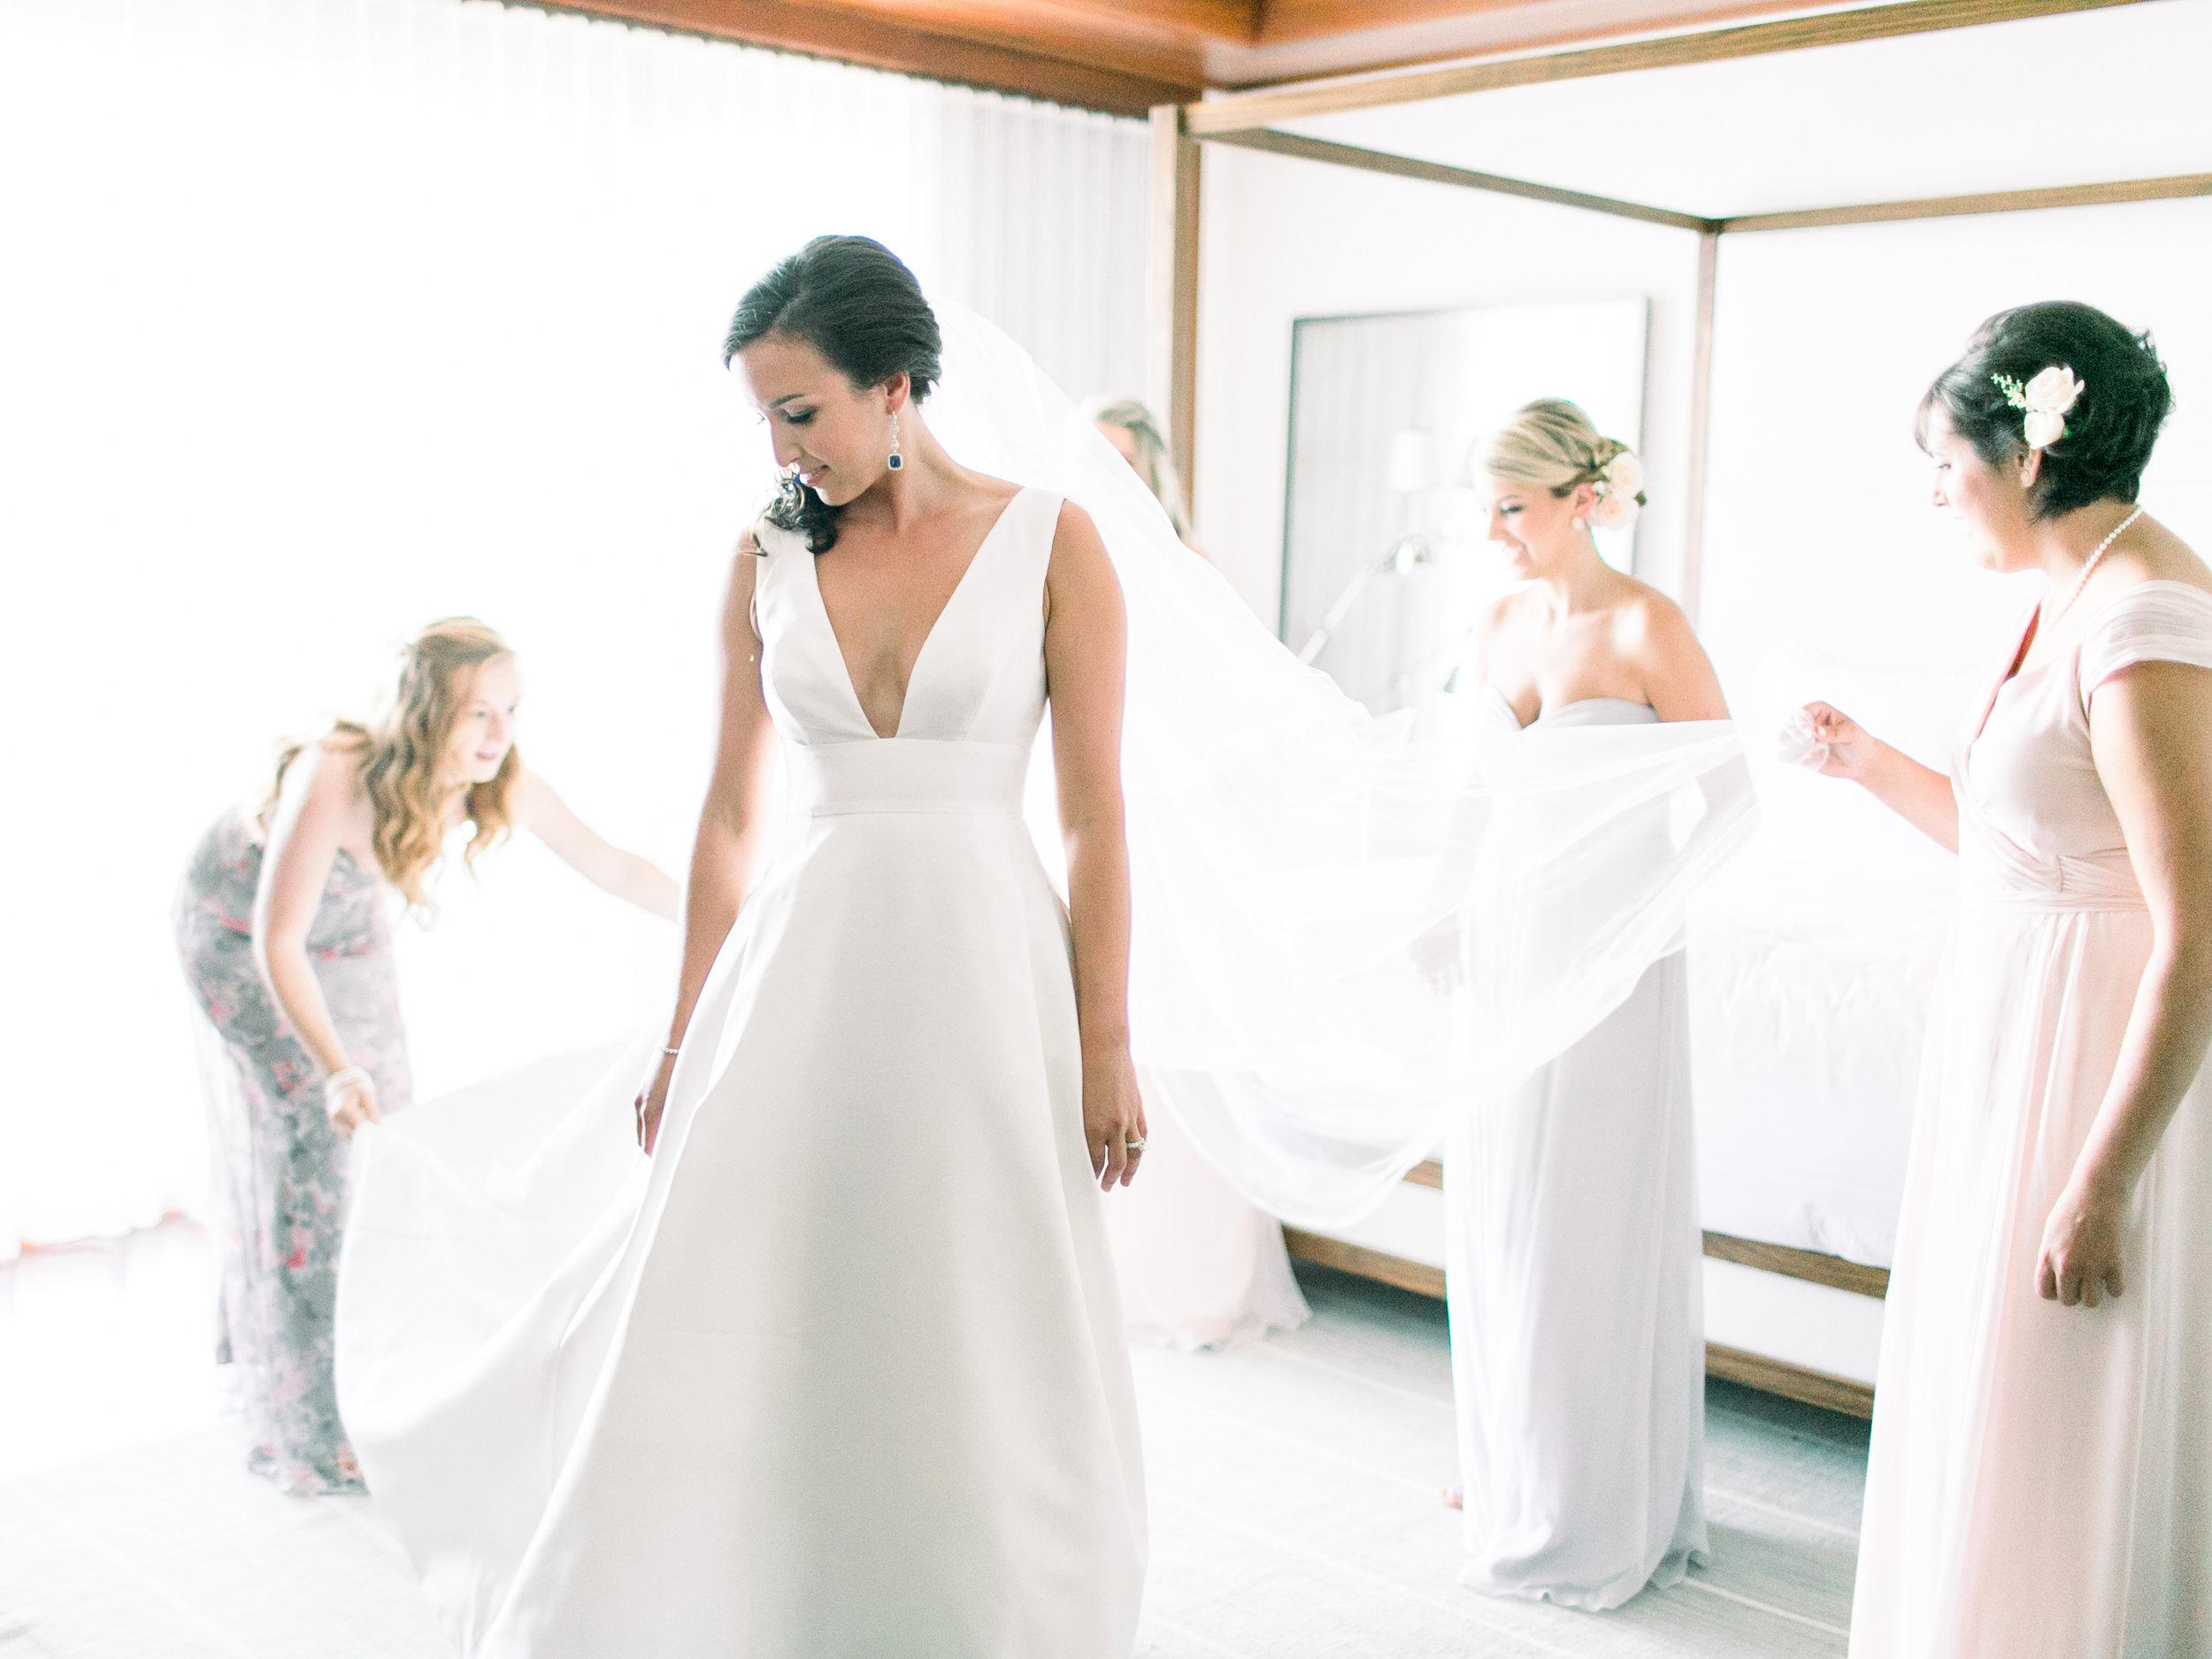 Maui-Fine-Art-Wedding-Photographer-05.JPG